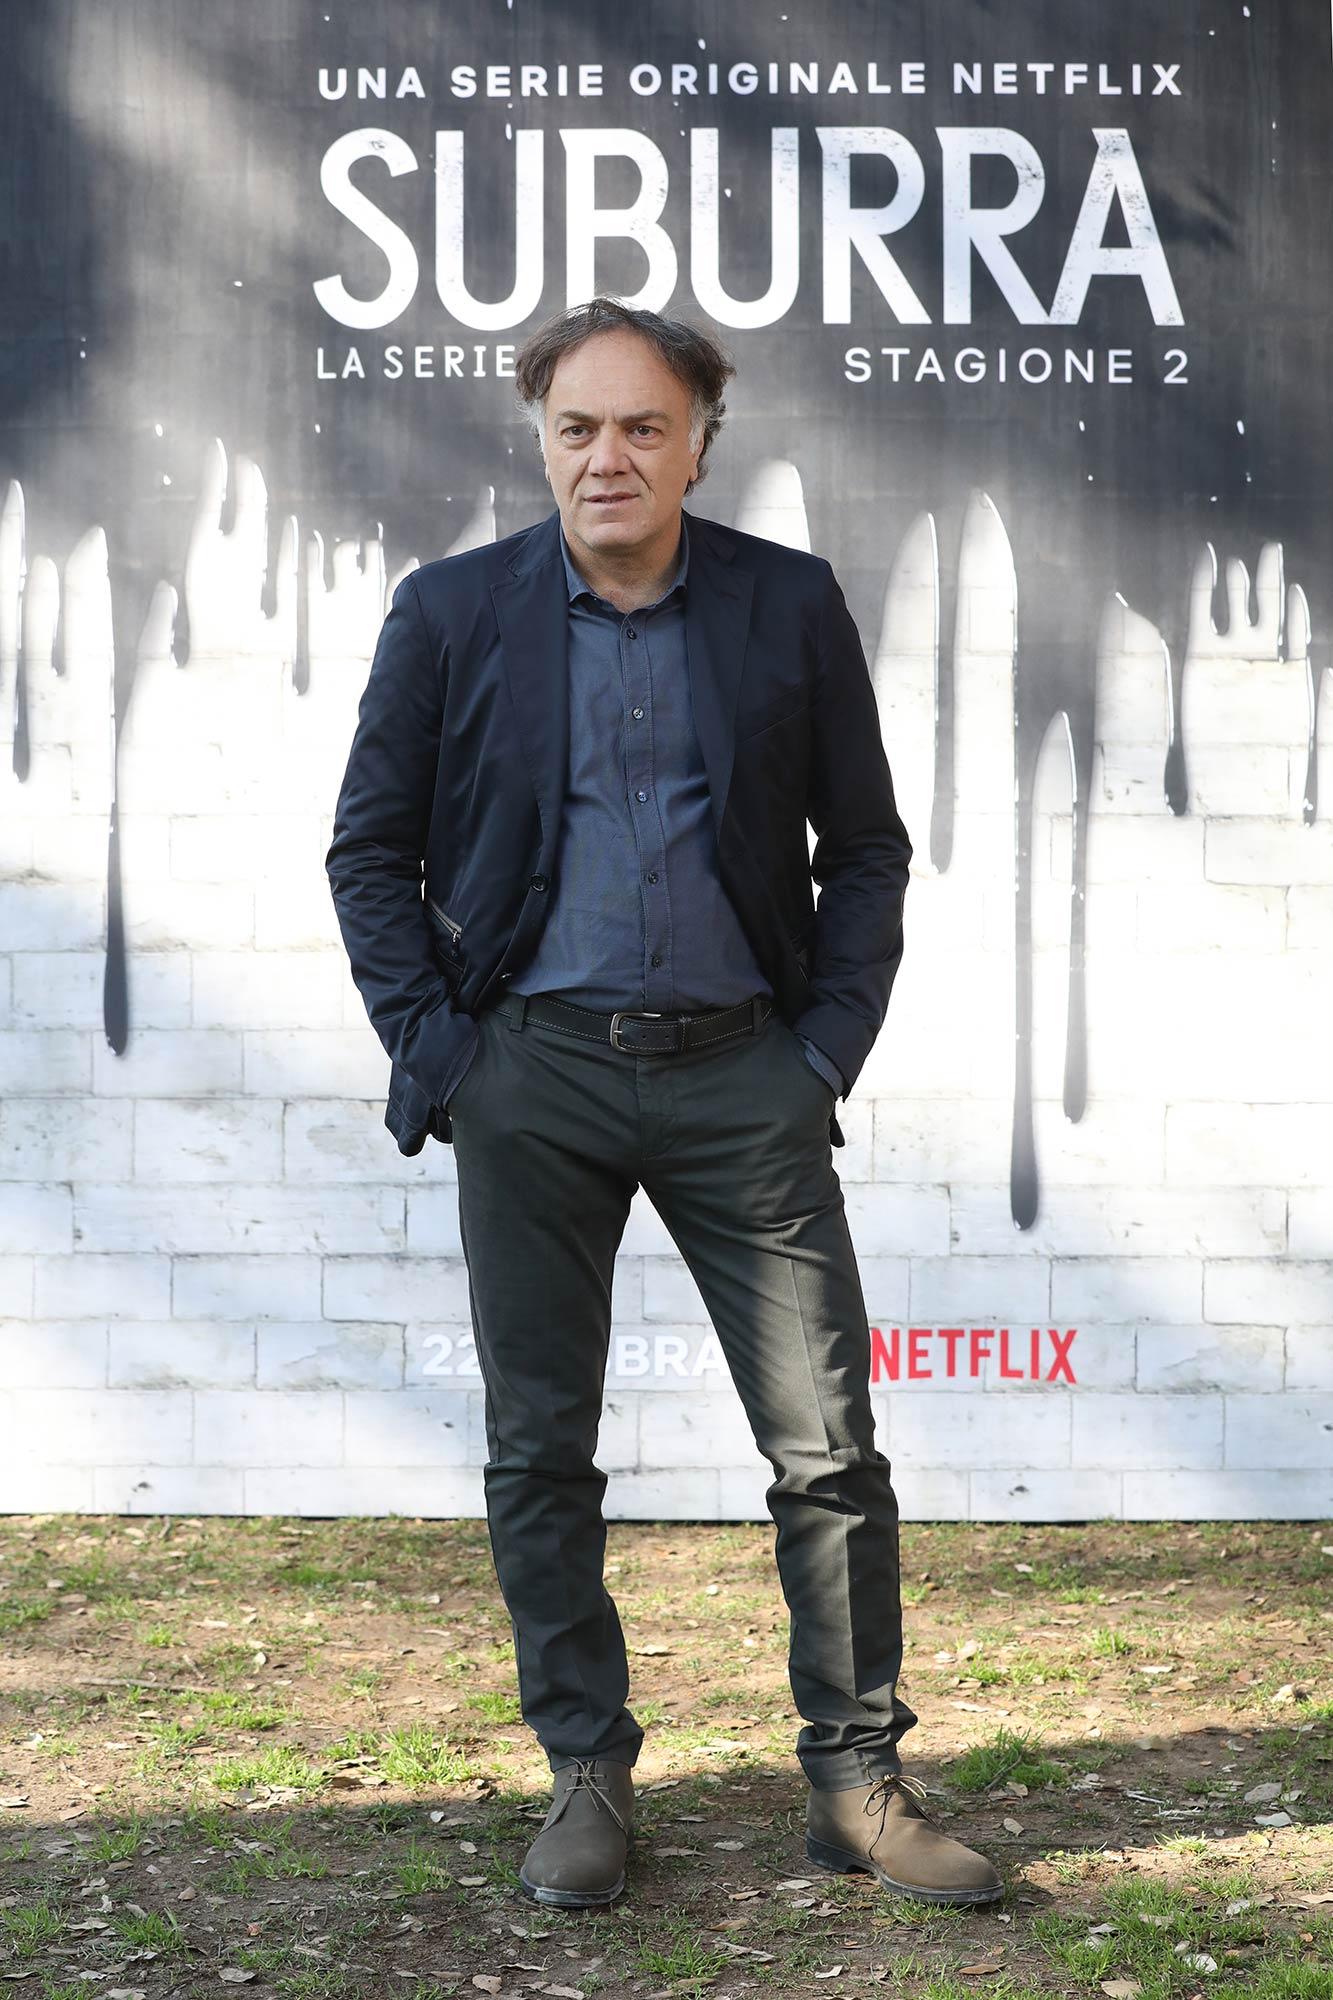 Netflix Premiere Suburra 2 - Francesco Acquaroli - Grooming Massimo Serini Team